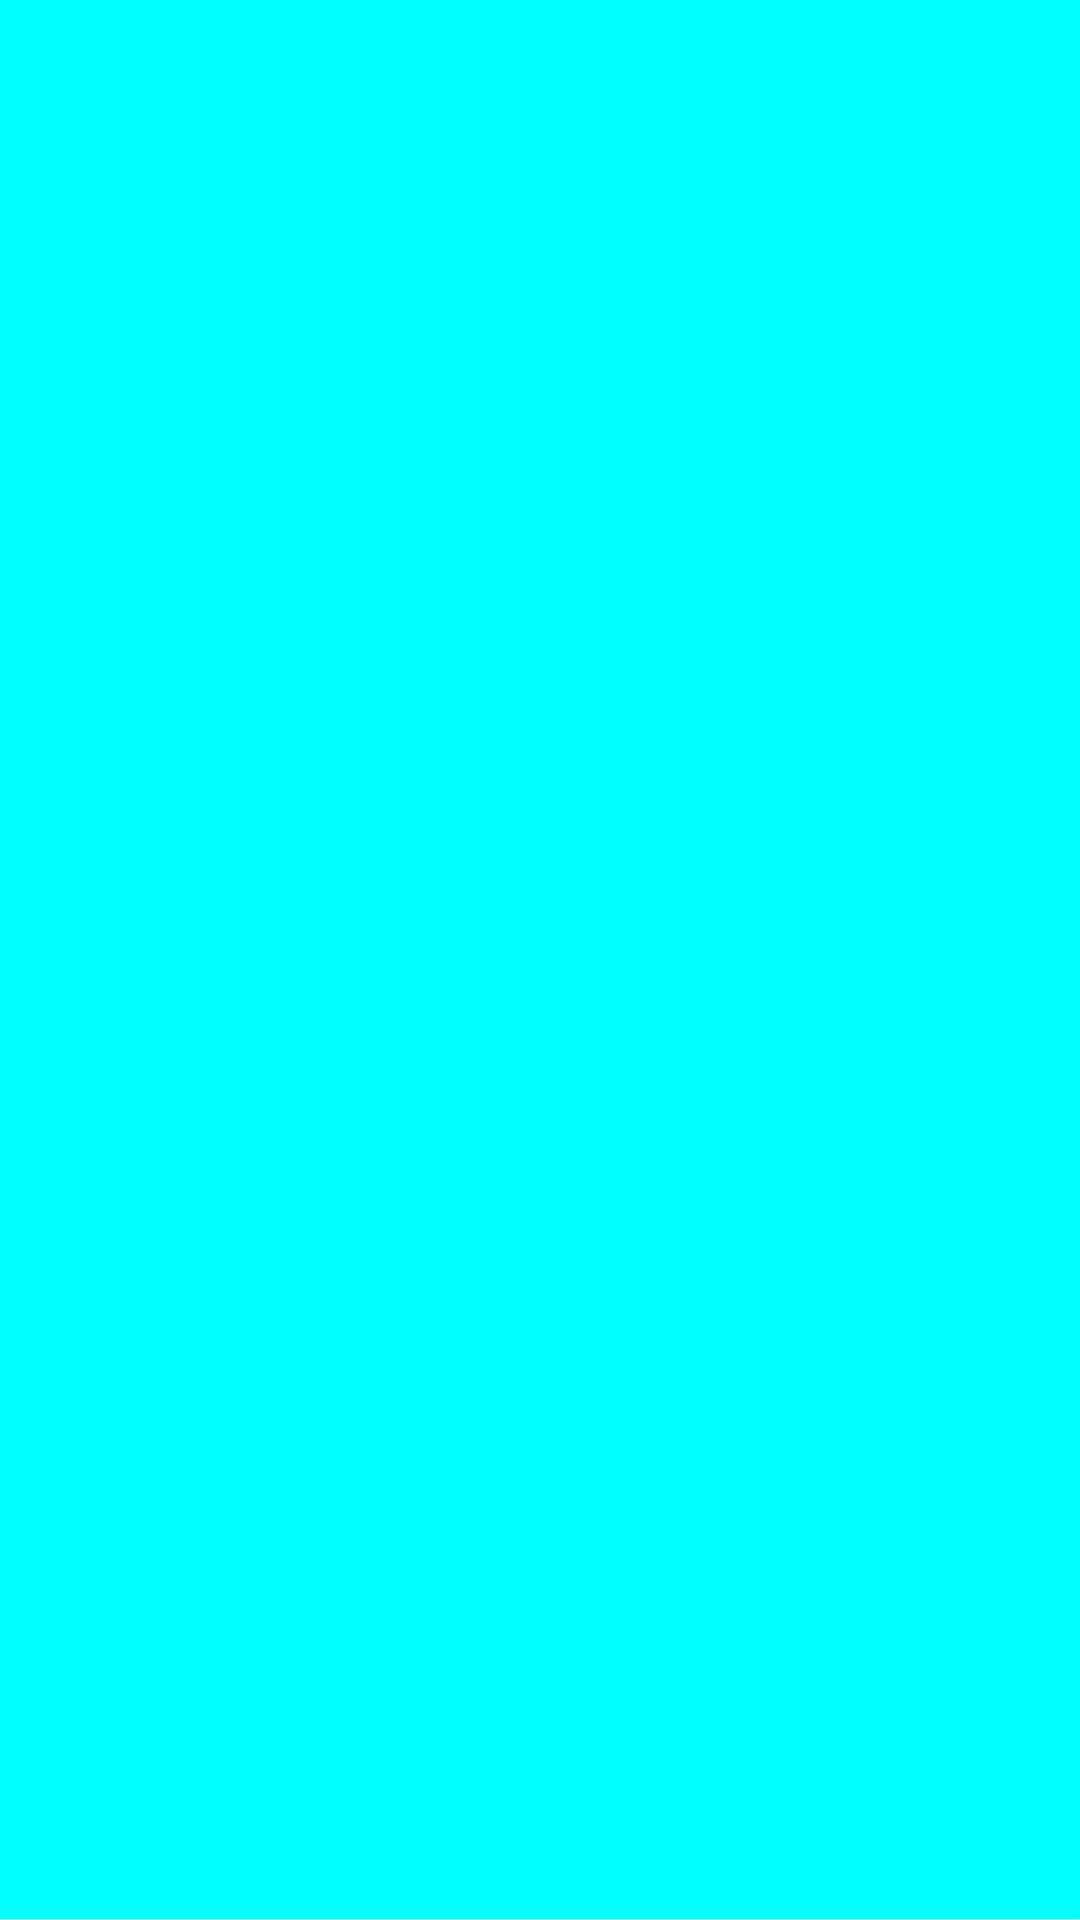 الألوان For Android Apk Download